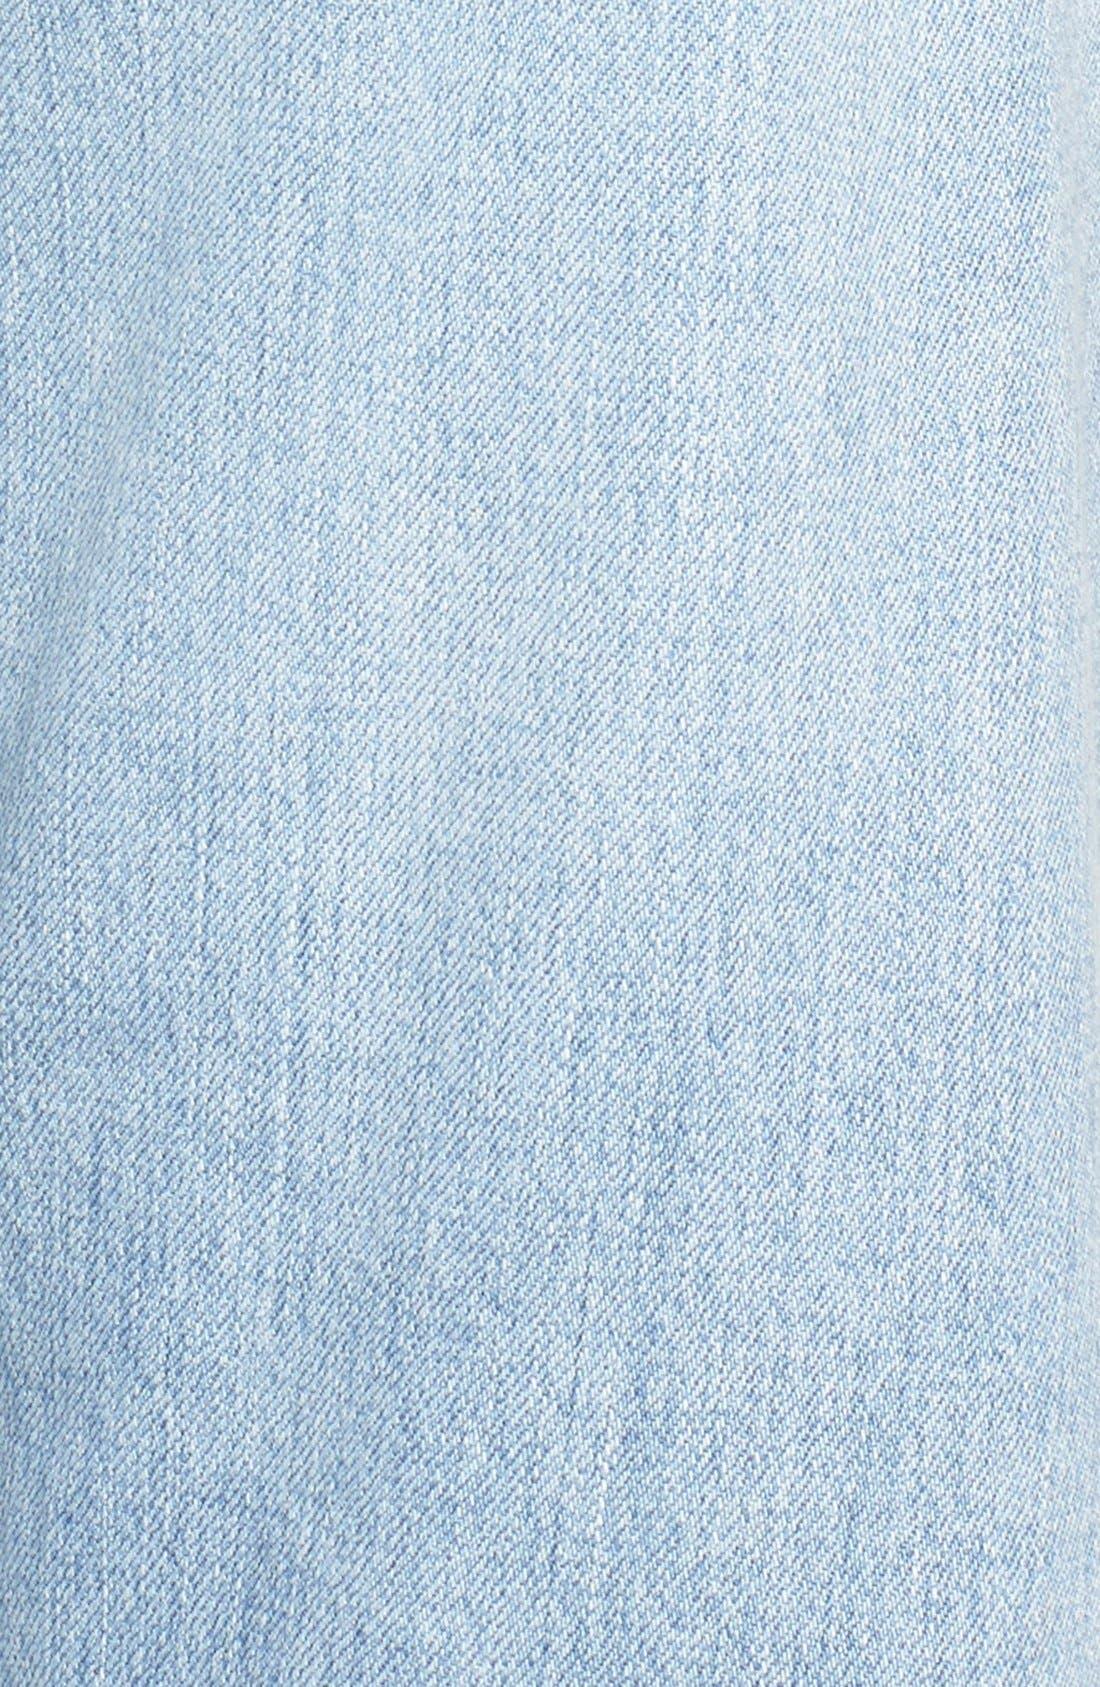 Cora High Waist Released Hem Boyfriend Jeans,                             Alternate thumbnail 6, color,                             454